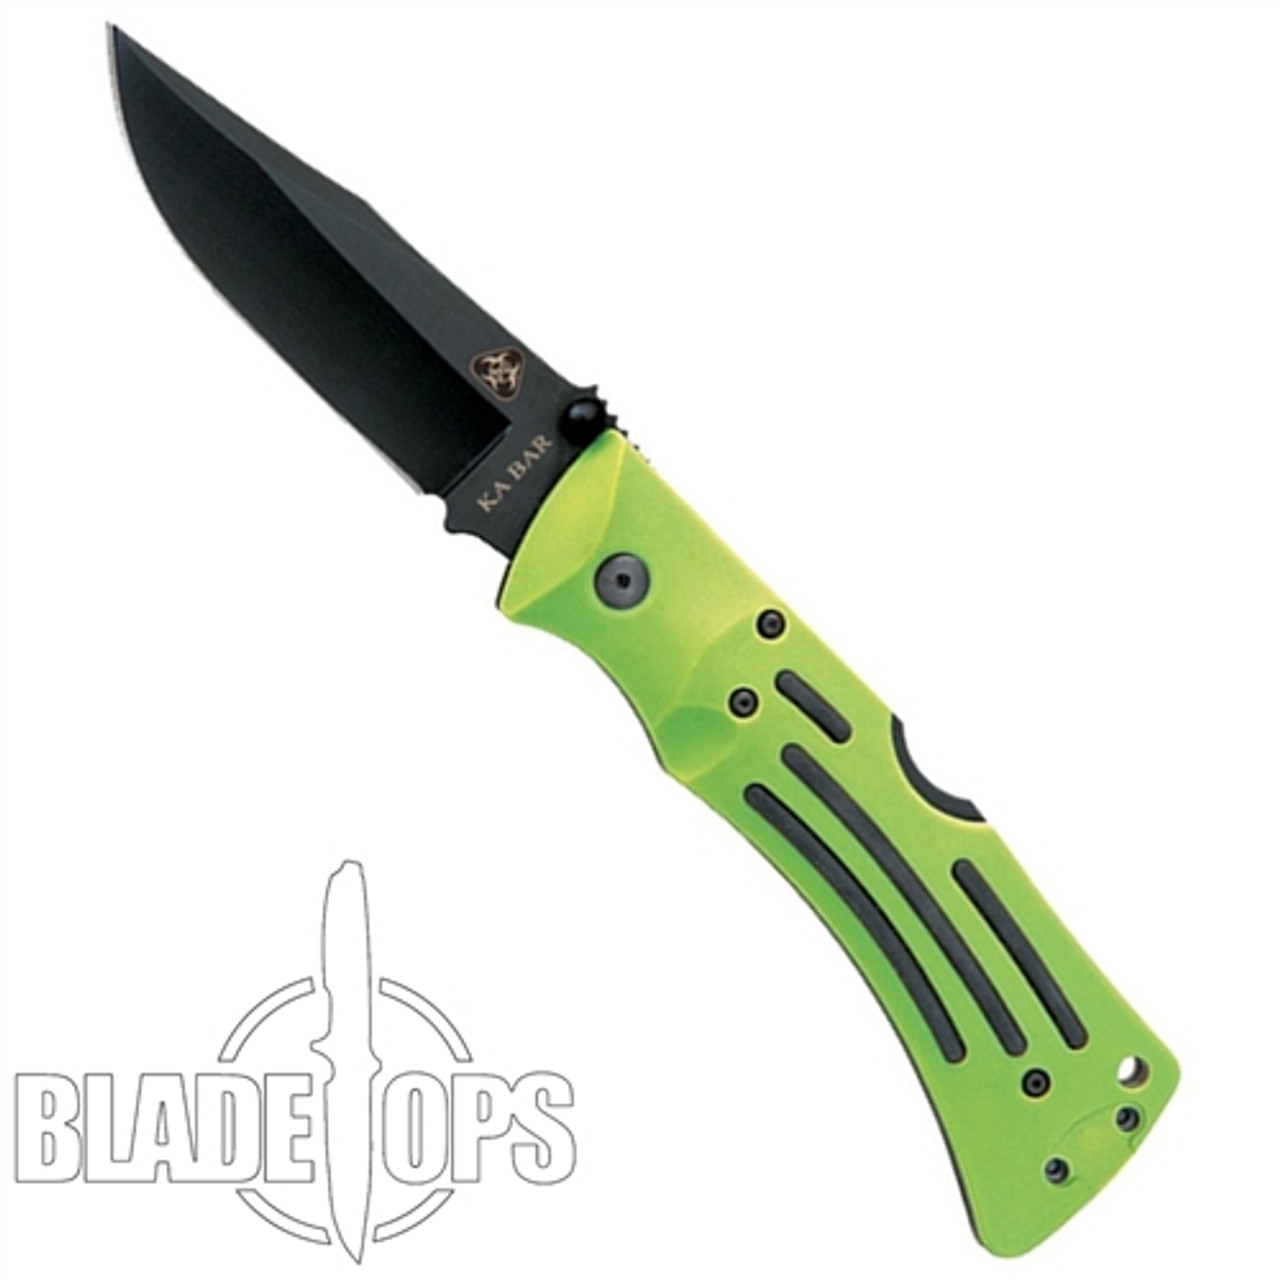 KA-BAR Zombie MULE LockBack Knife, Black Clip Point Blade